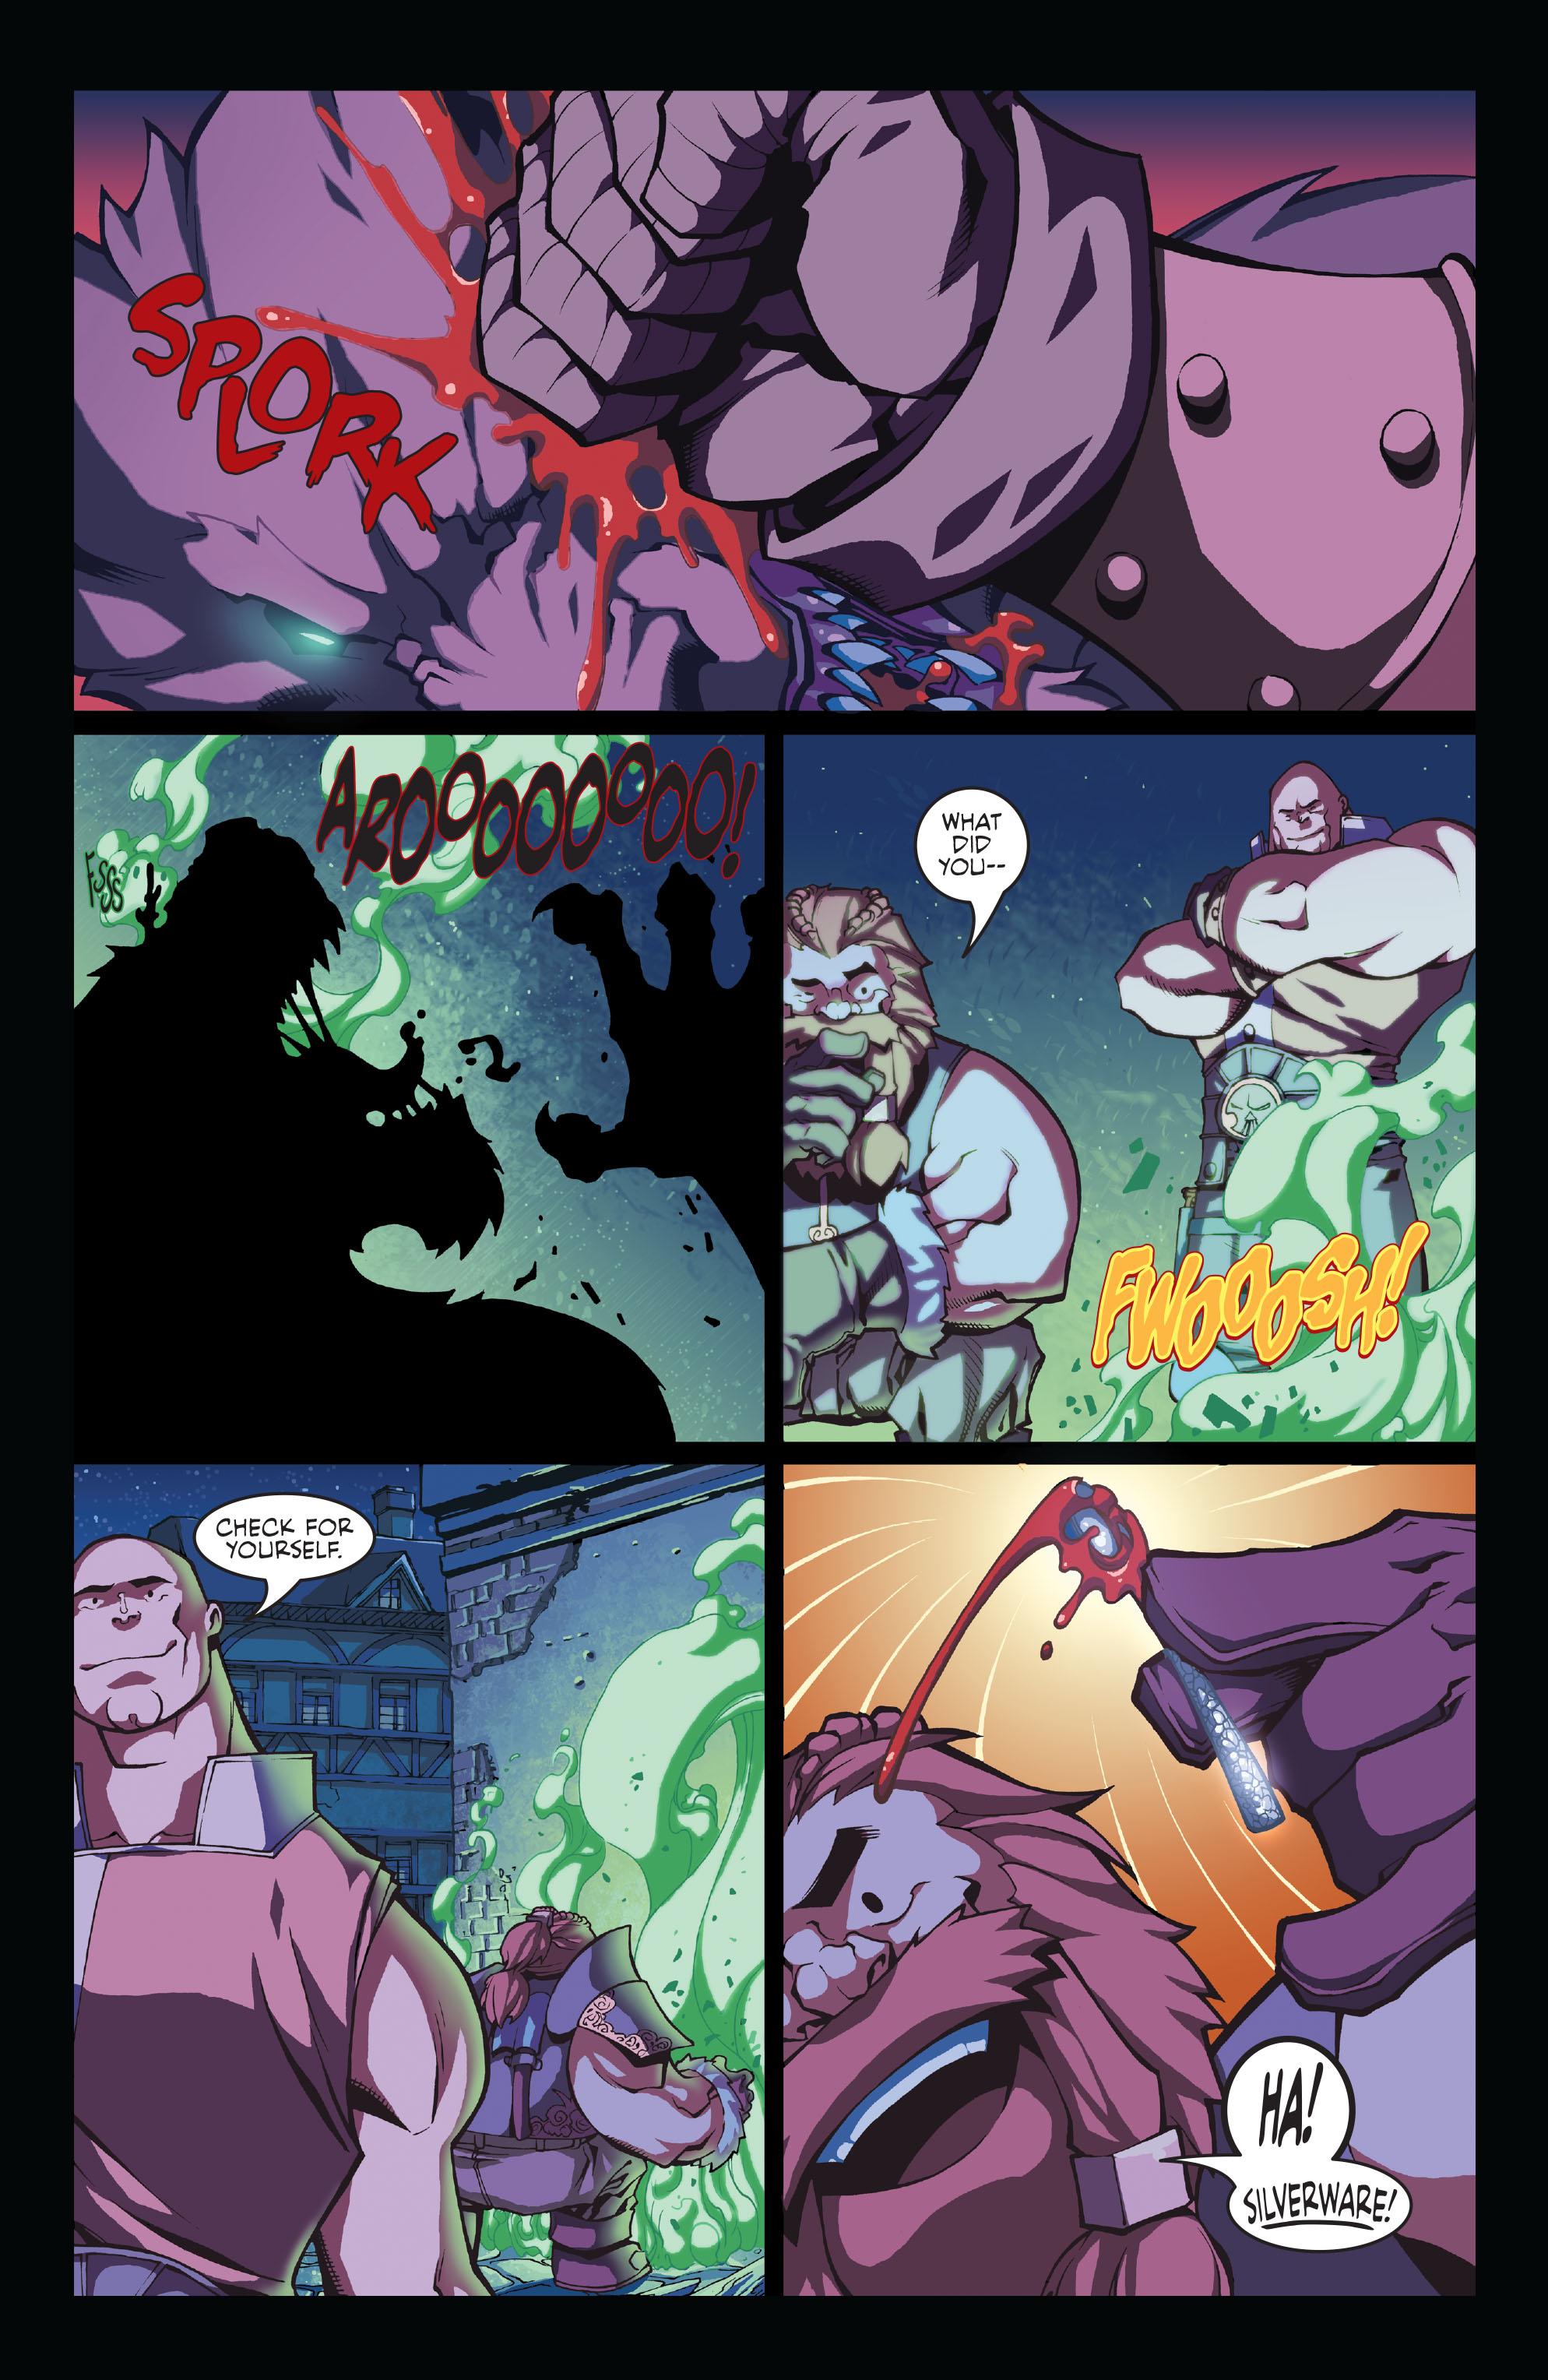 Read online Skullkickers comic -  Issue #1 - 7